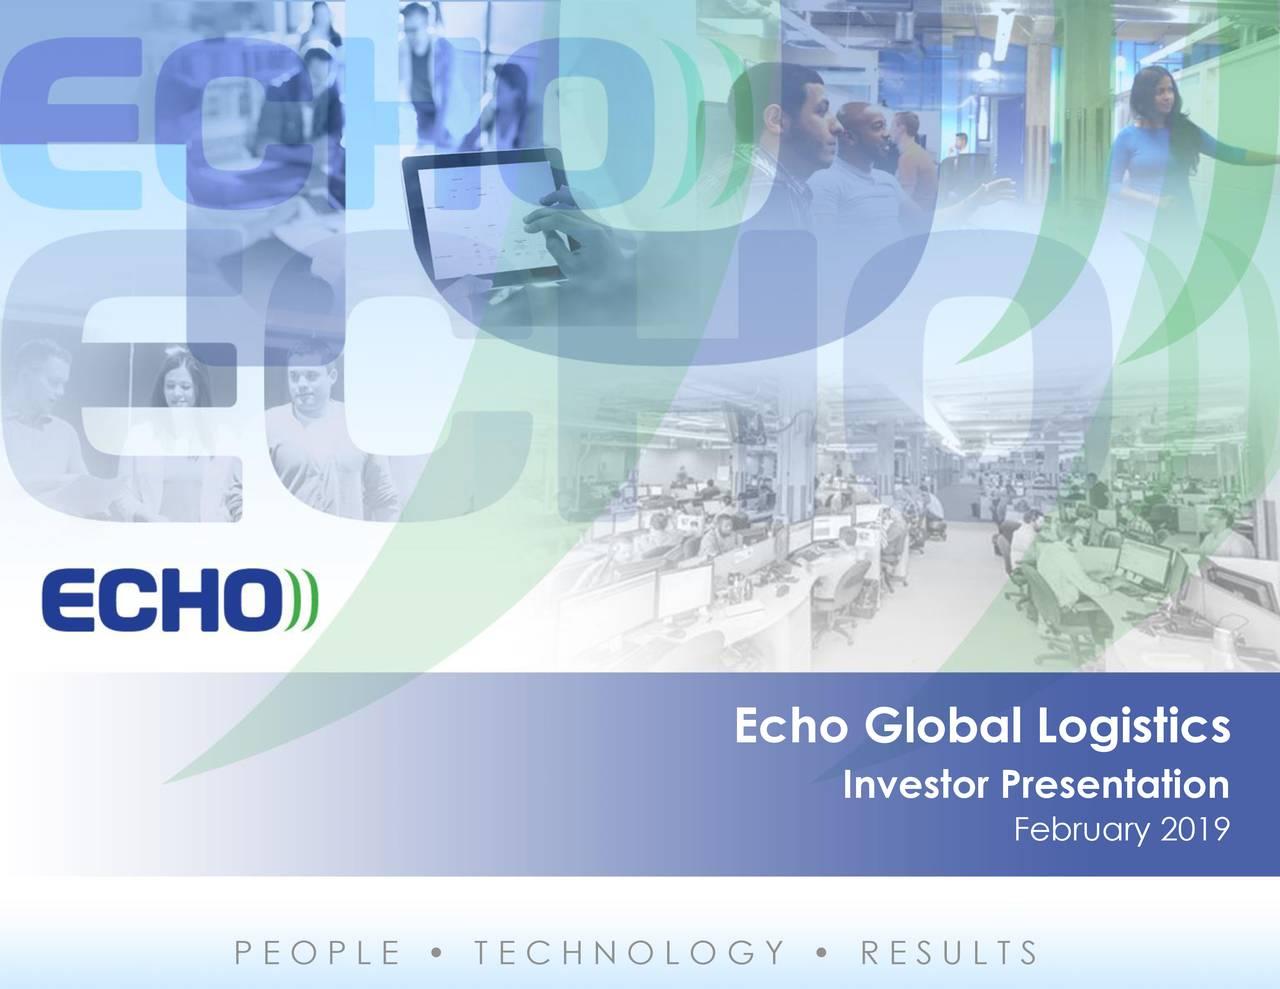 Echo Global Logistics (ECHO) Investor Presentation